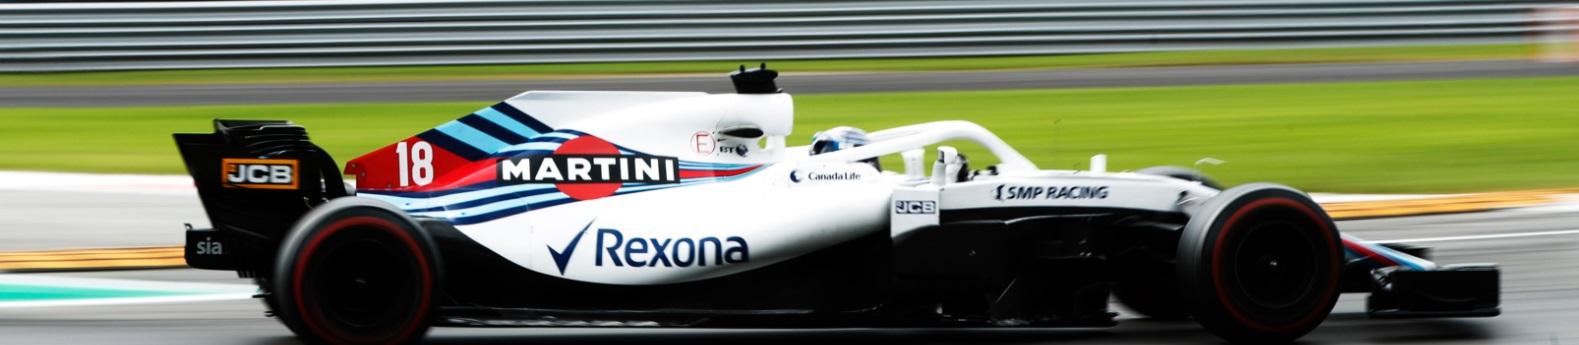 Domingo en Italia - Williams: puntos que saben a gloria